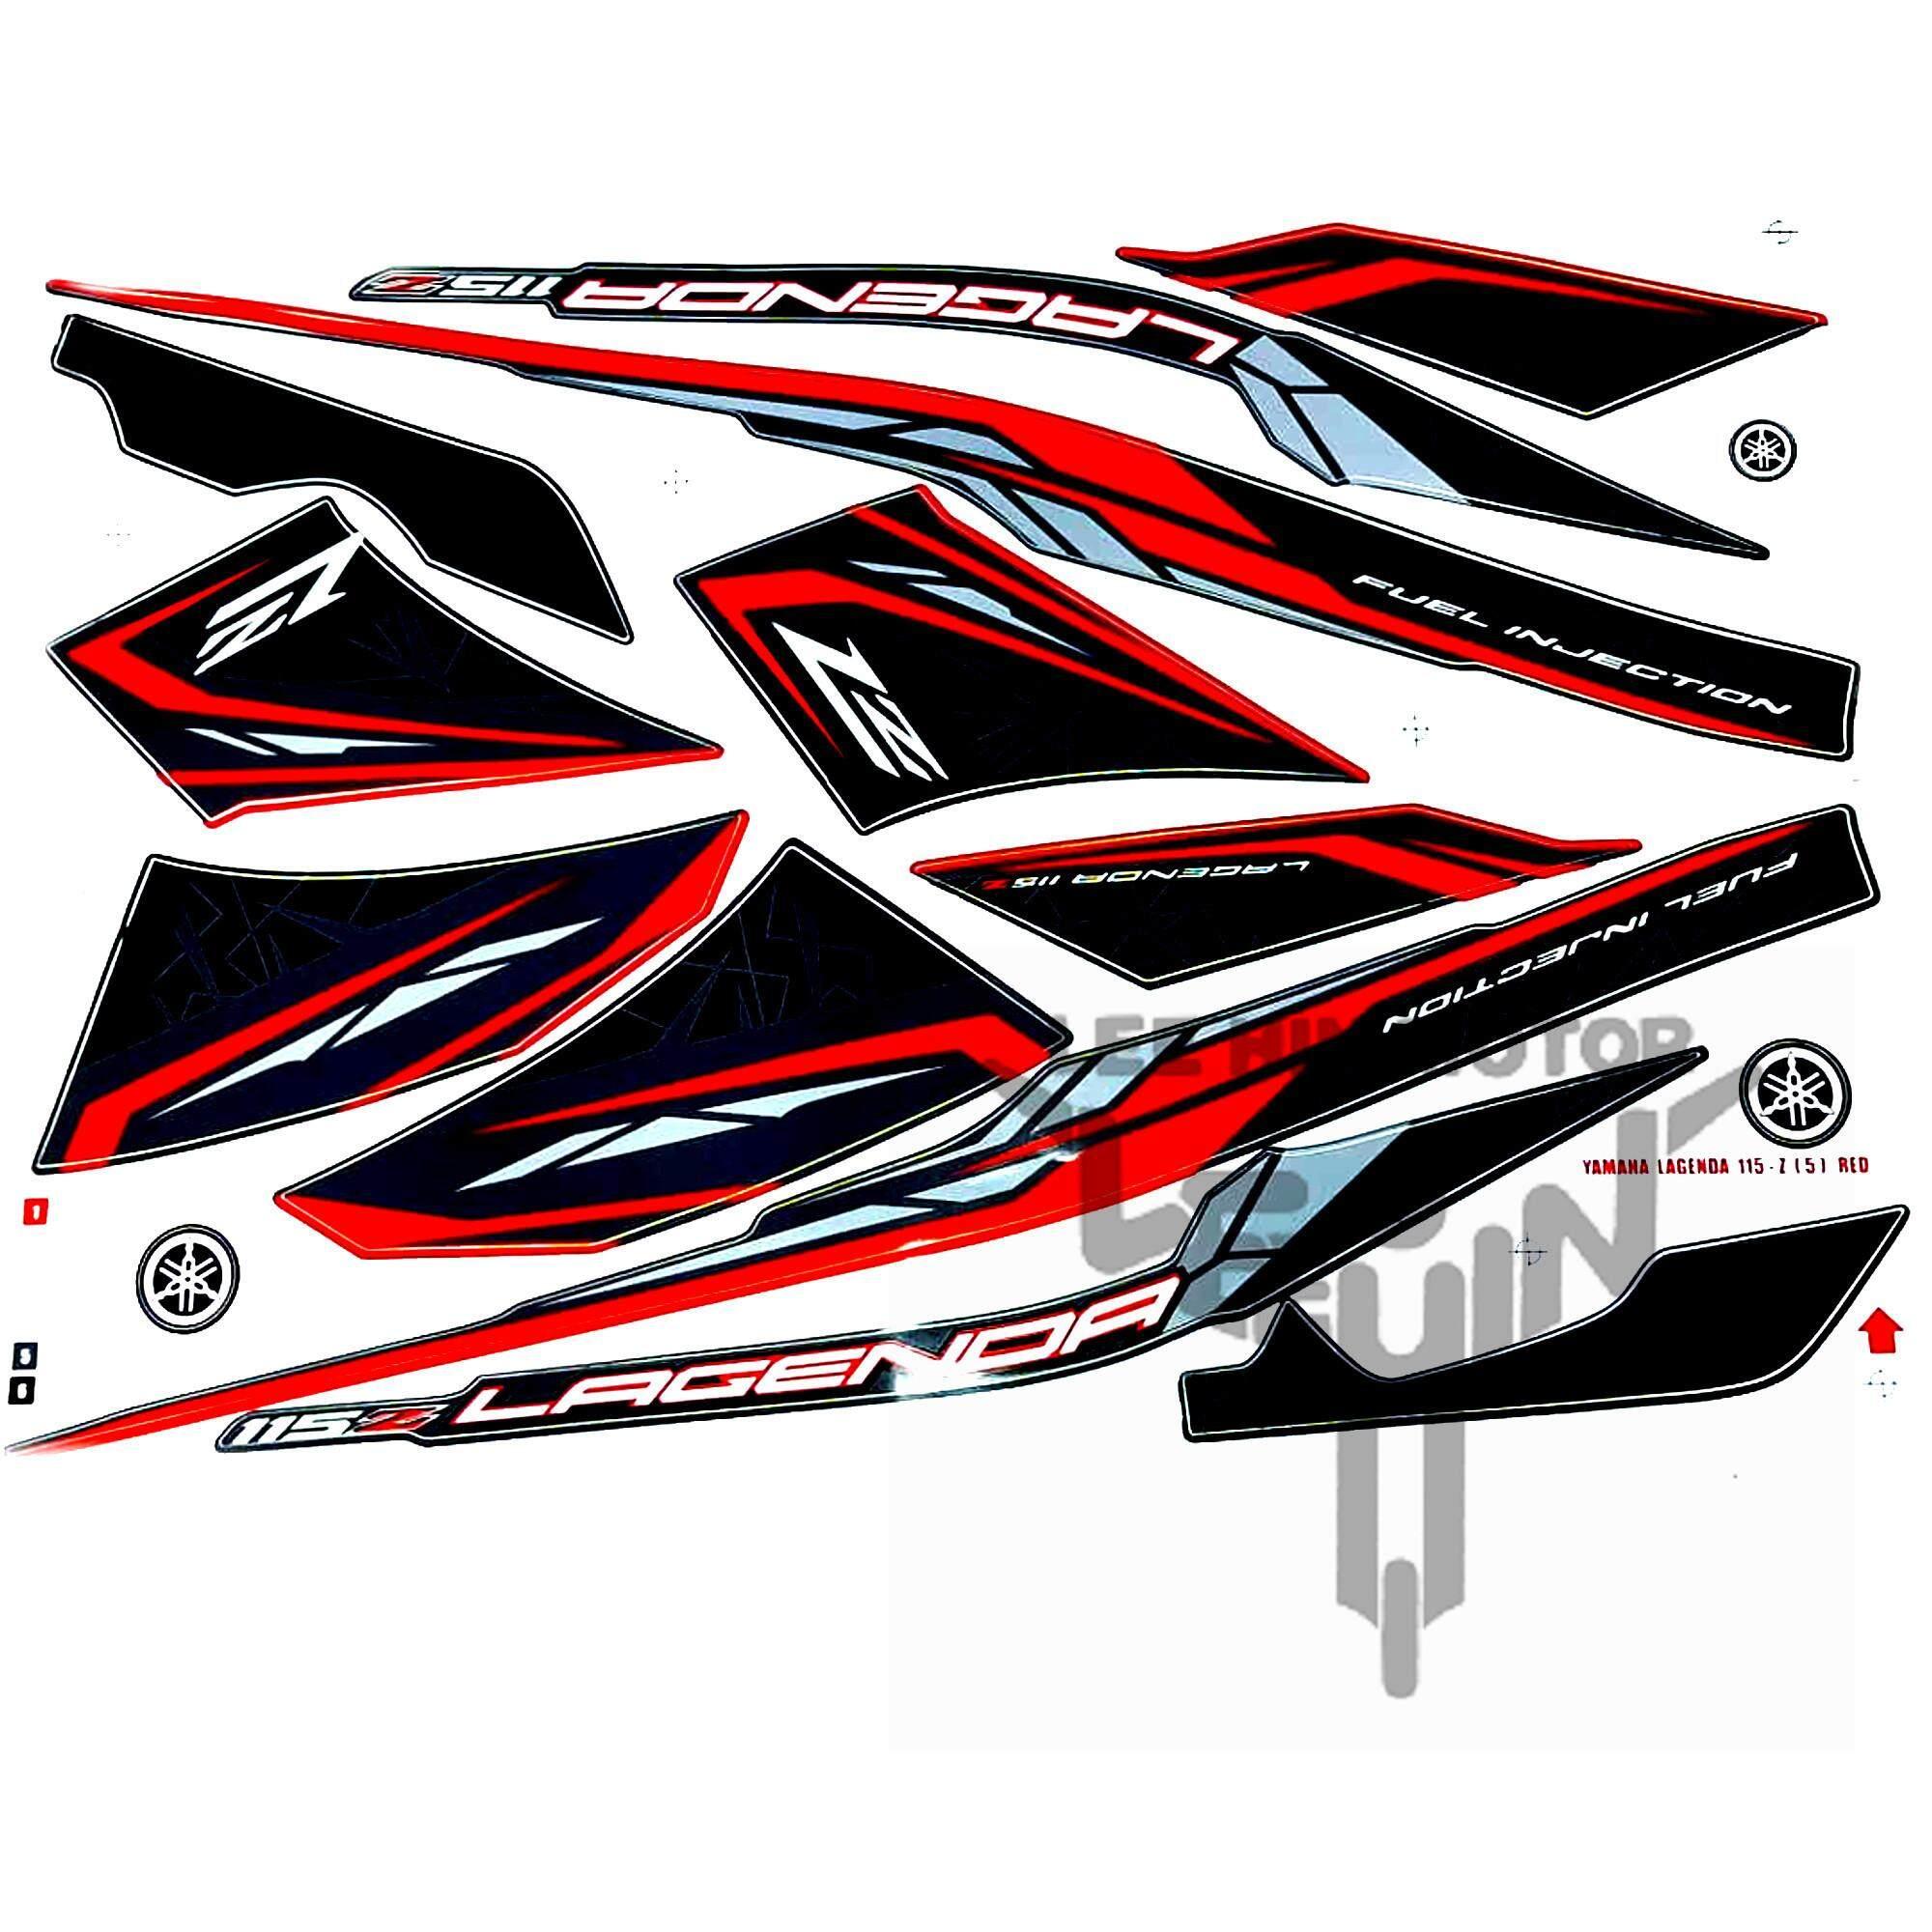 Grade AAA Yamaha Lagenda 115z Body Sticker / Body Stripe, Red